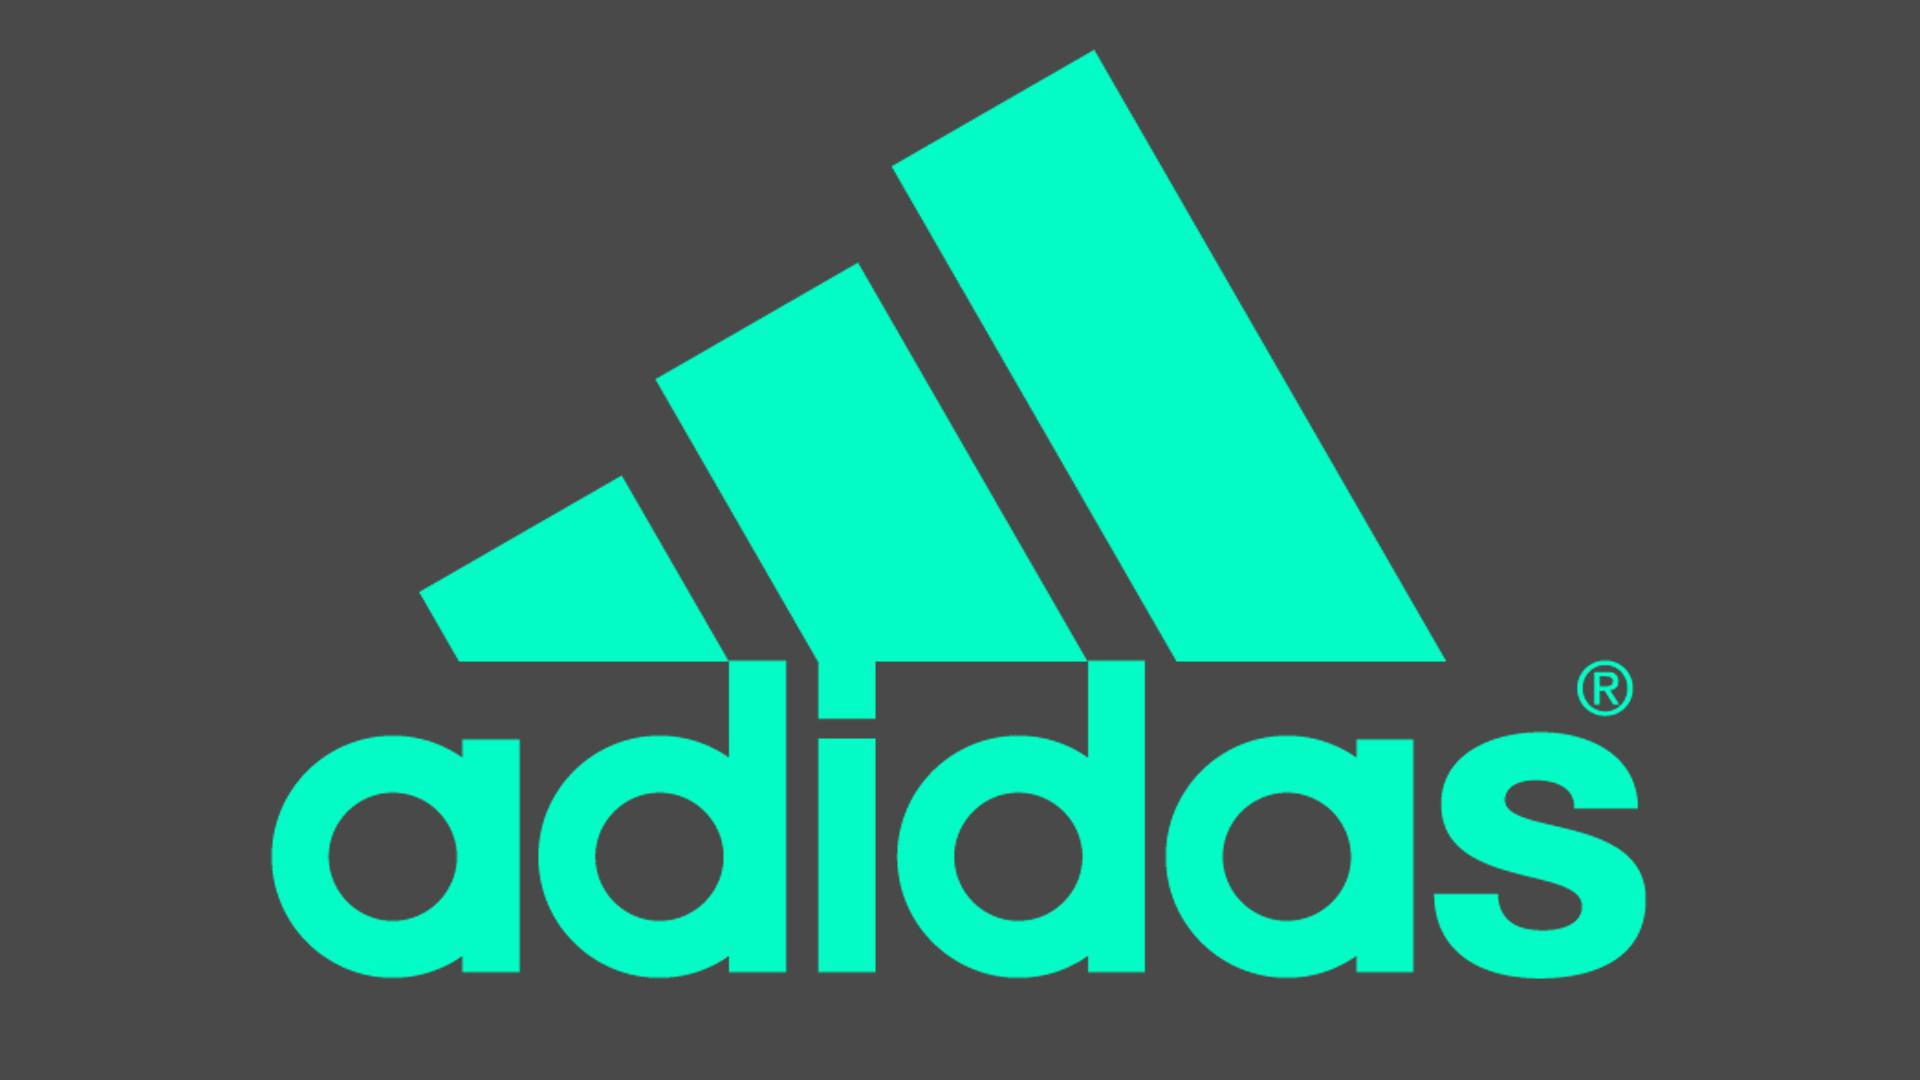 The Avegners Wallpaper Quotes Adidas Logo Wallpapers Pixelstalk Net